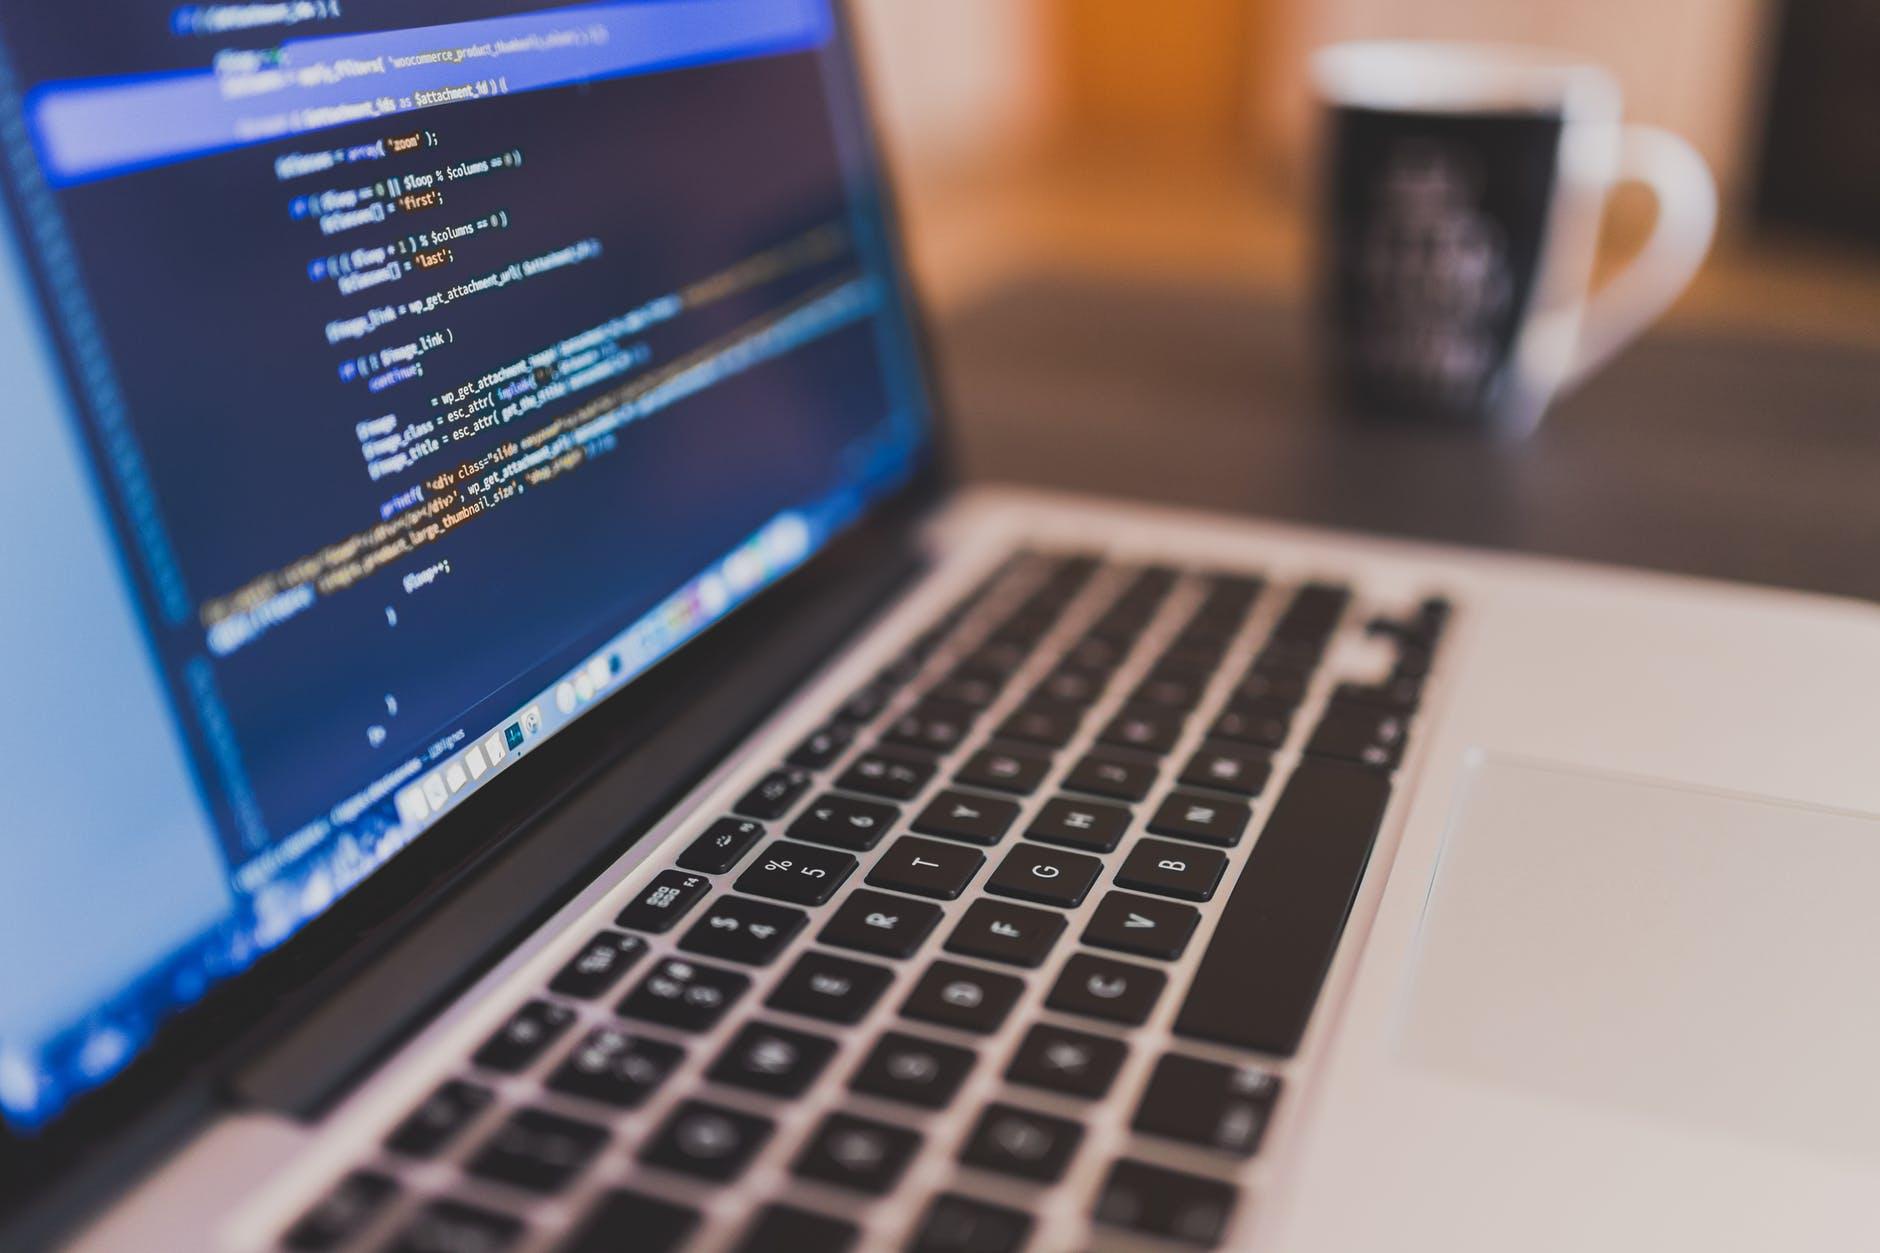 coffee writing computer blogging